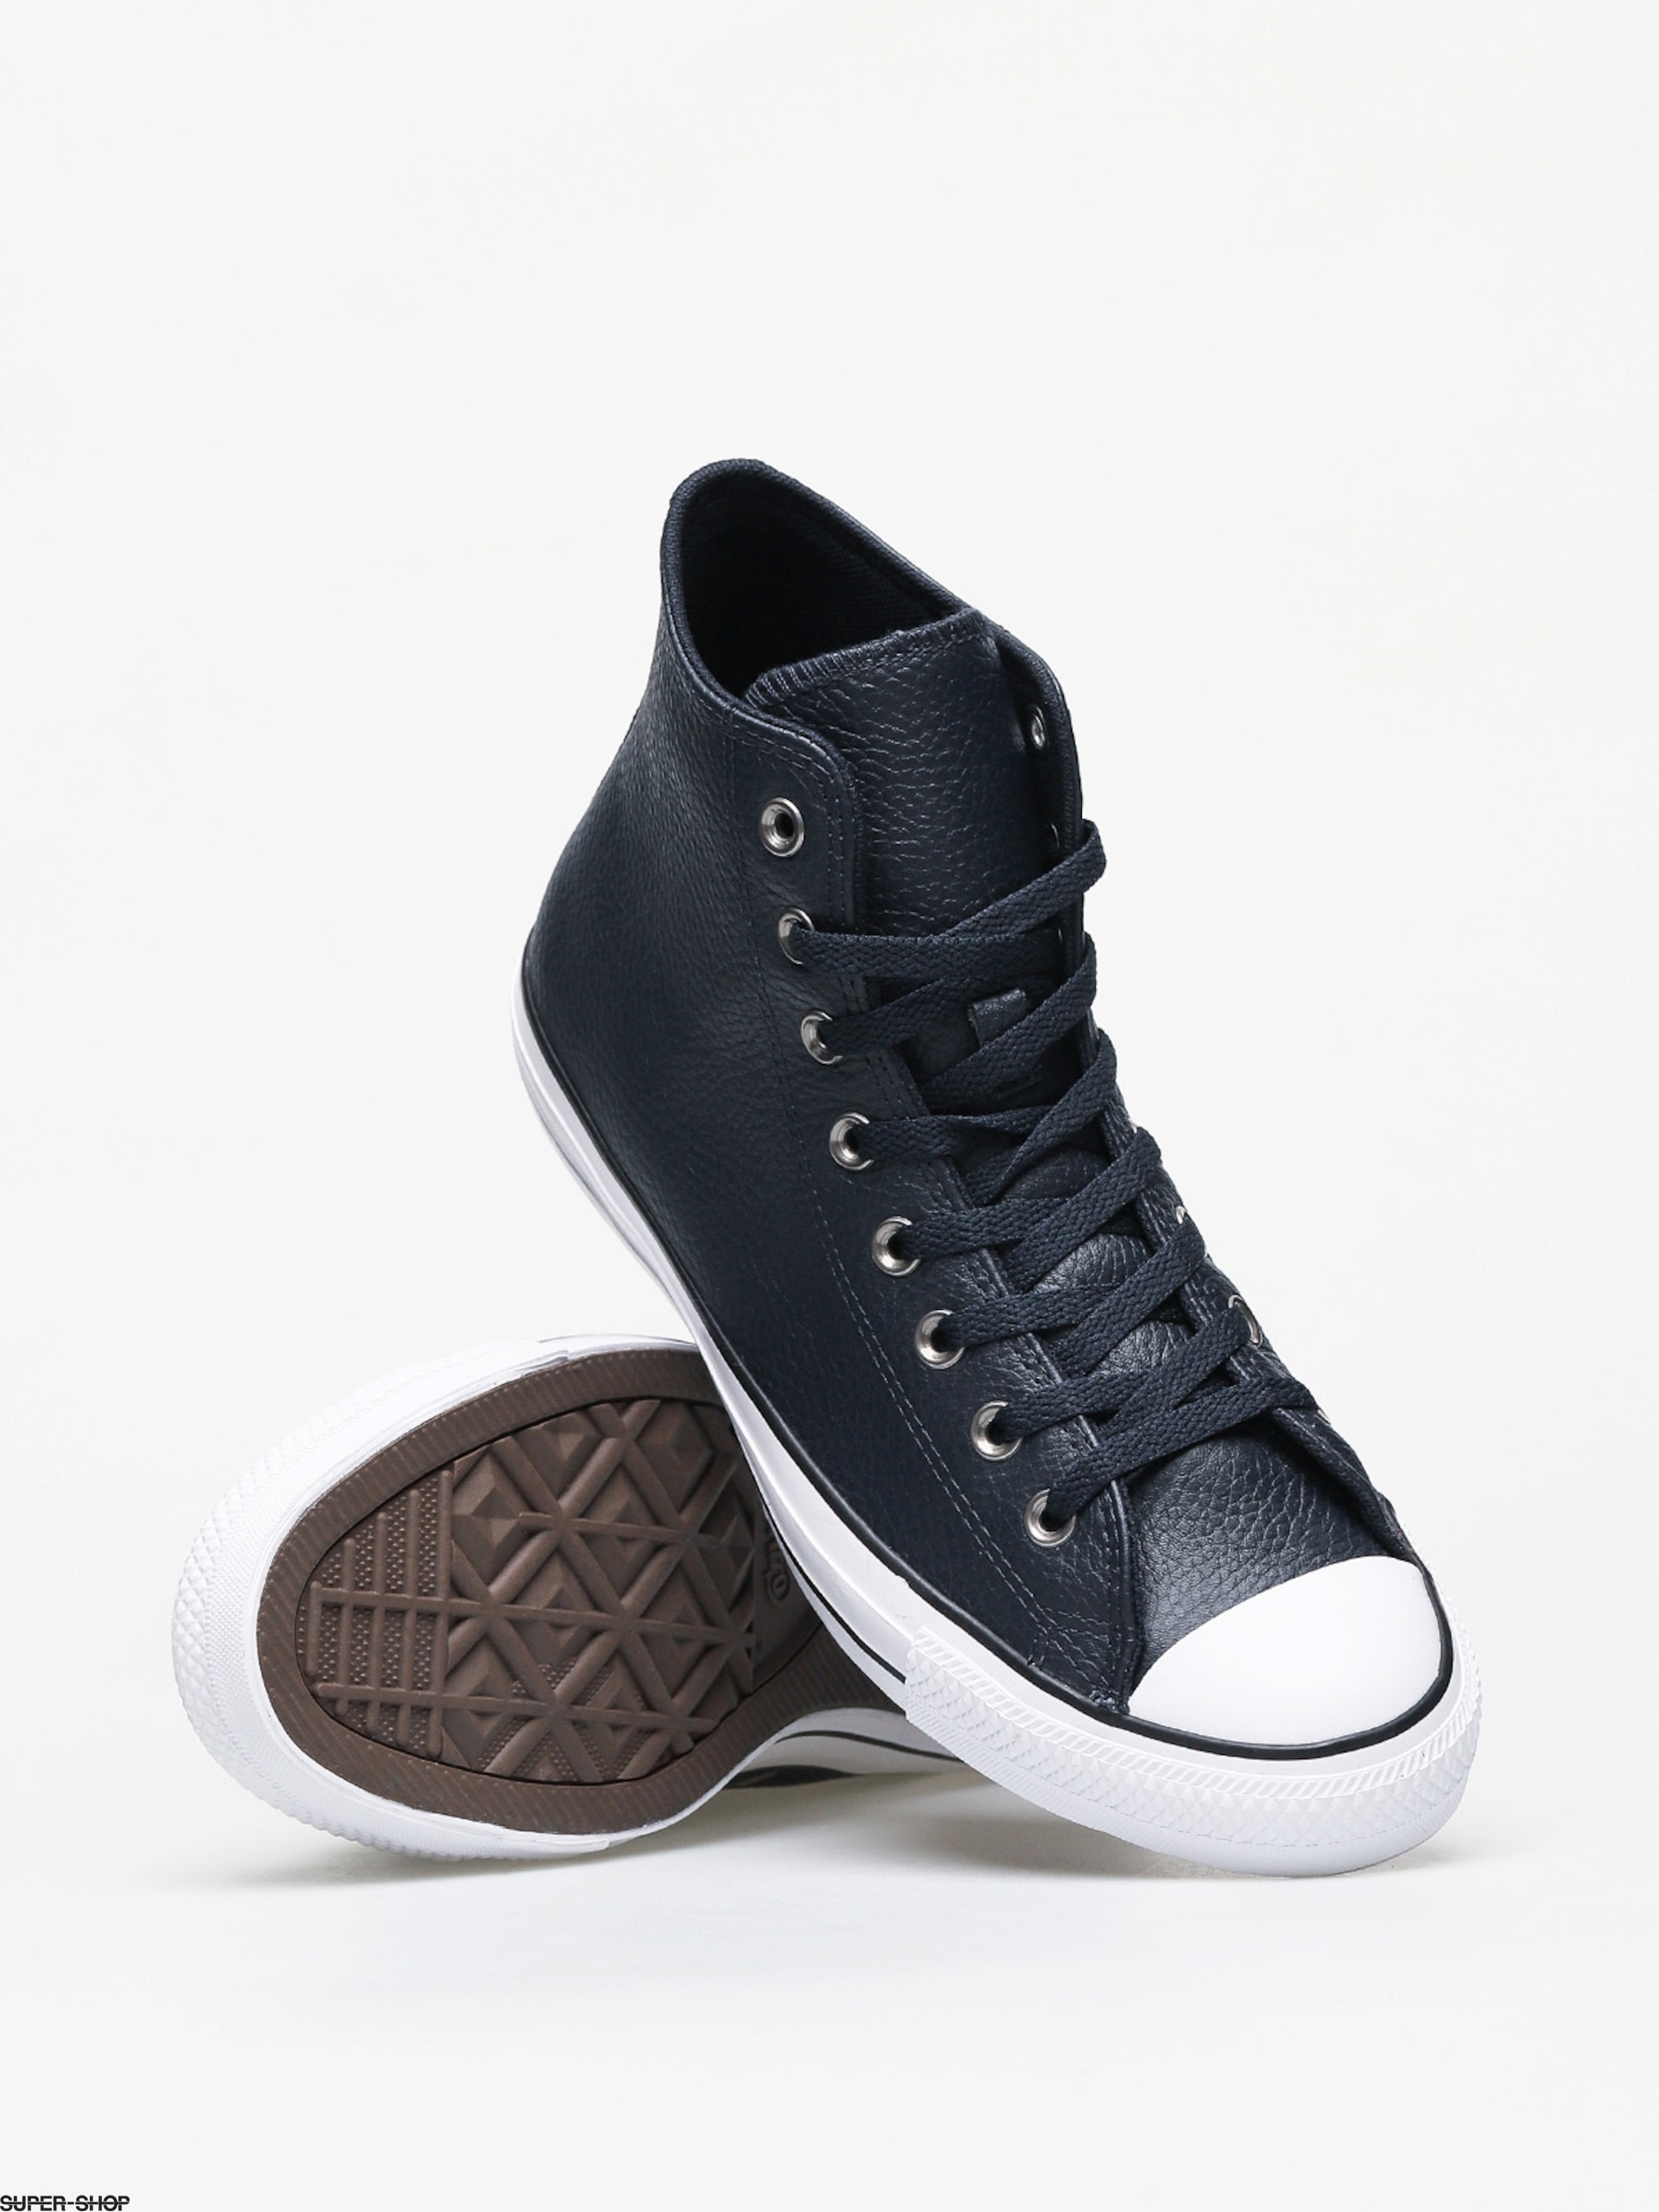 converse chuck taylor hi leather